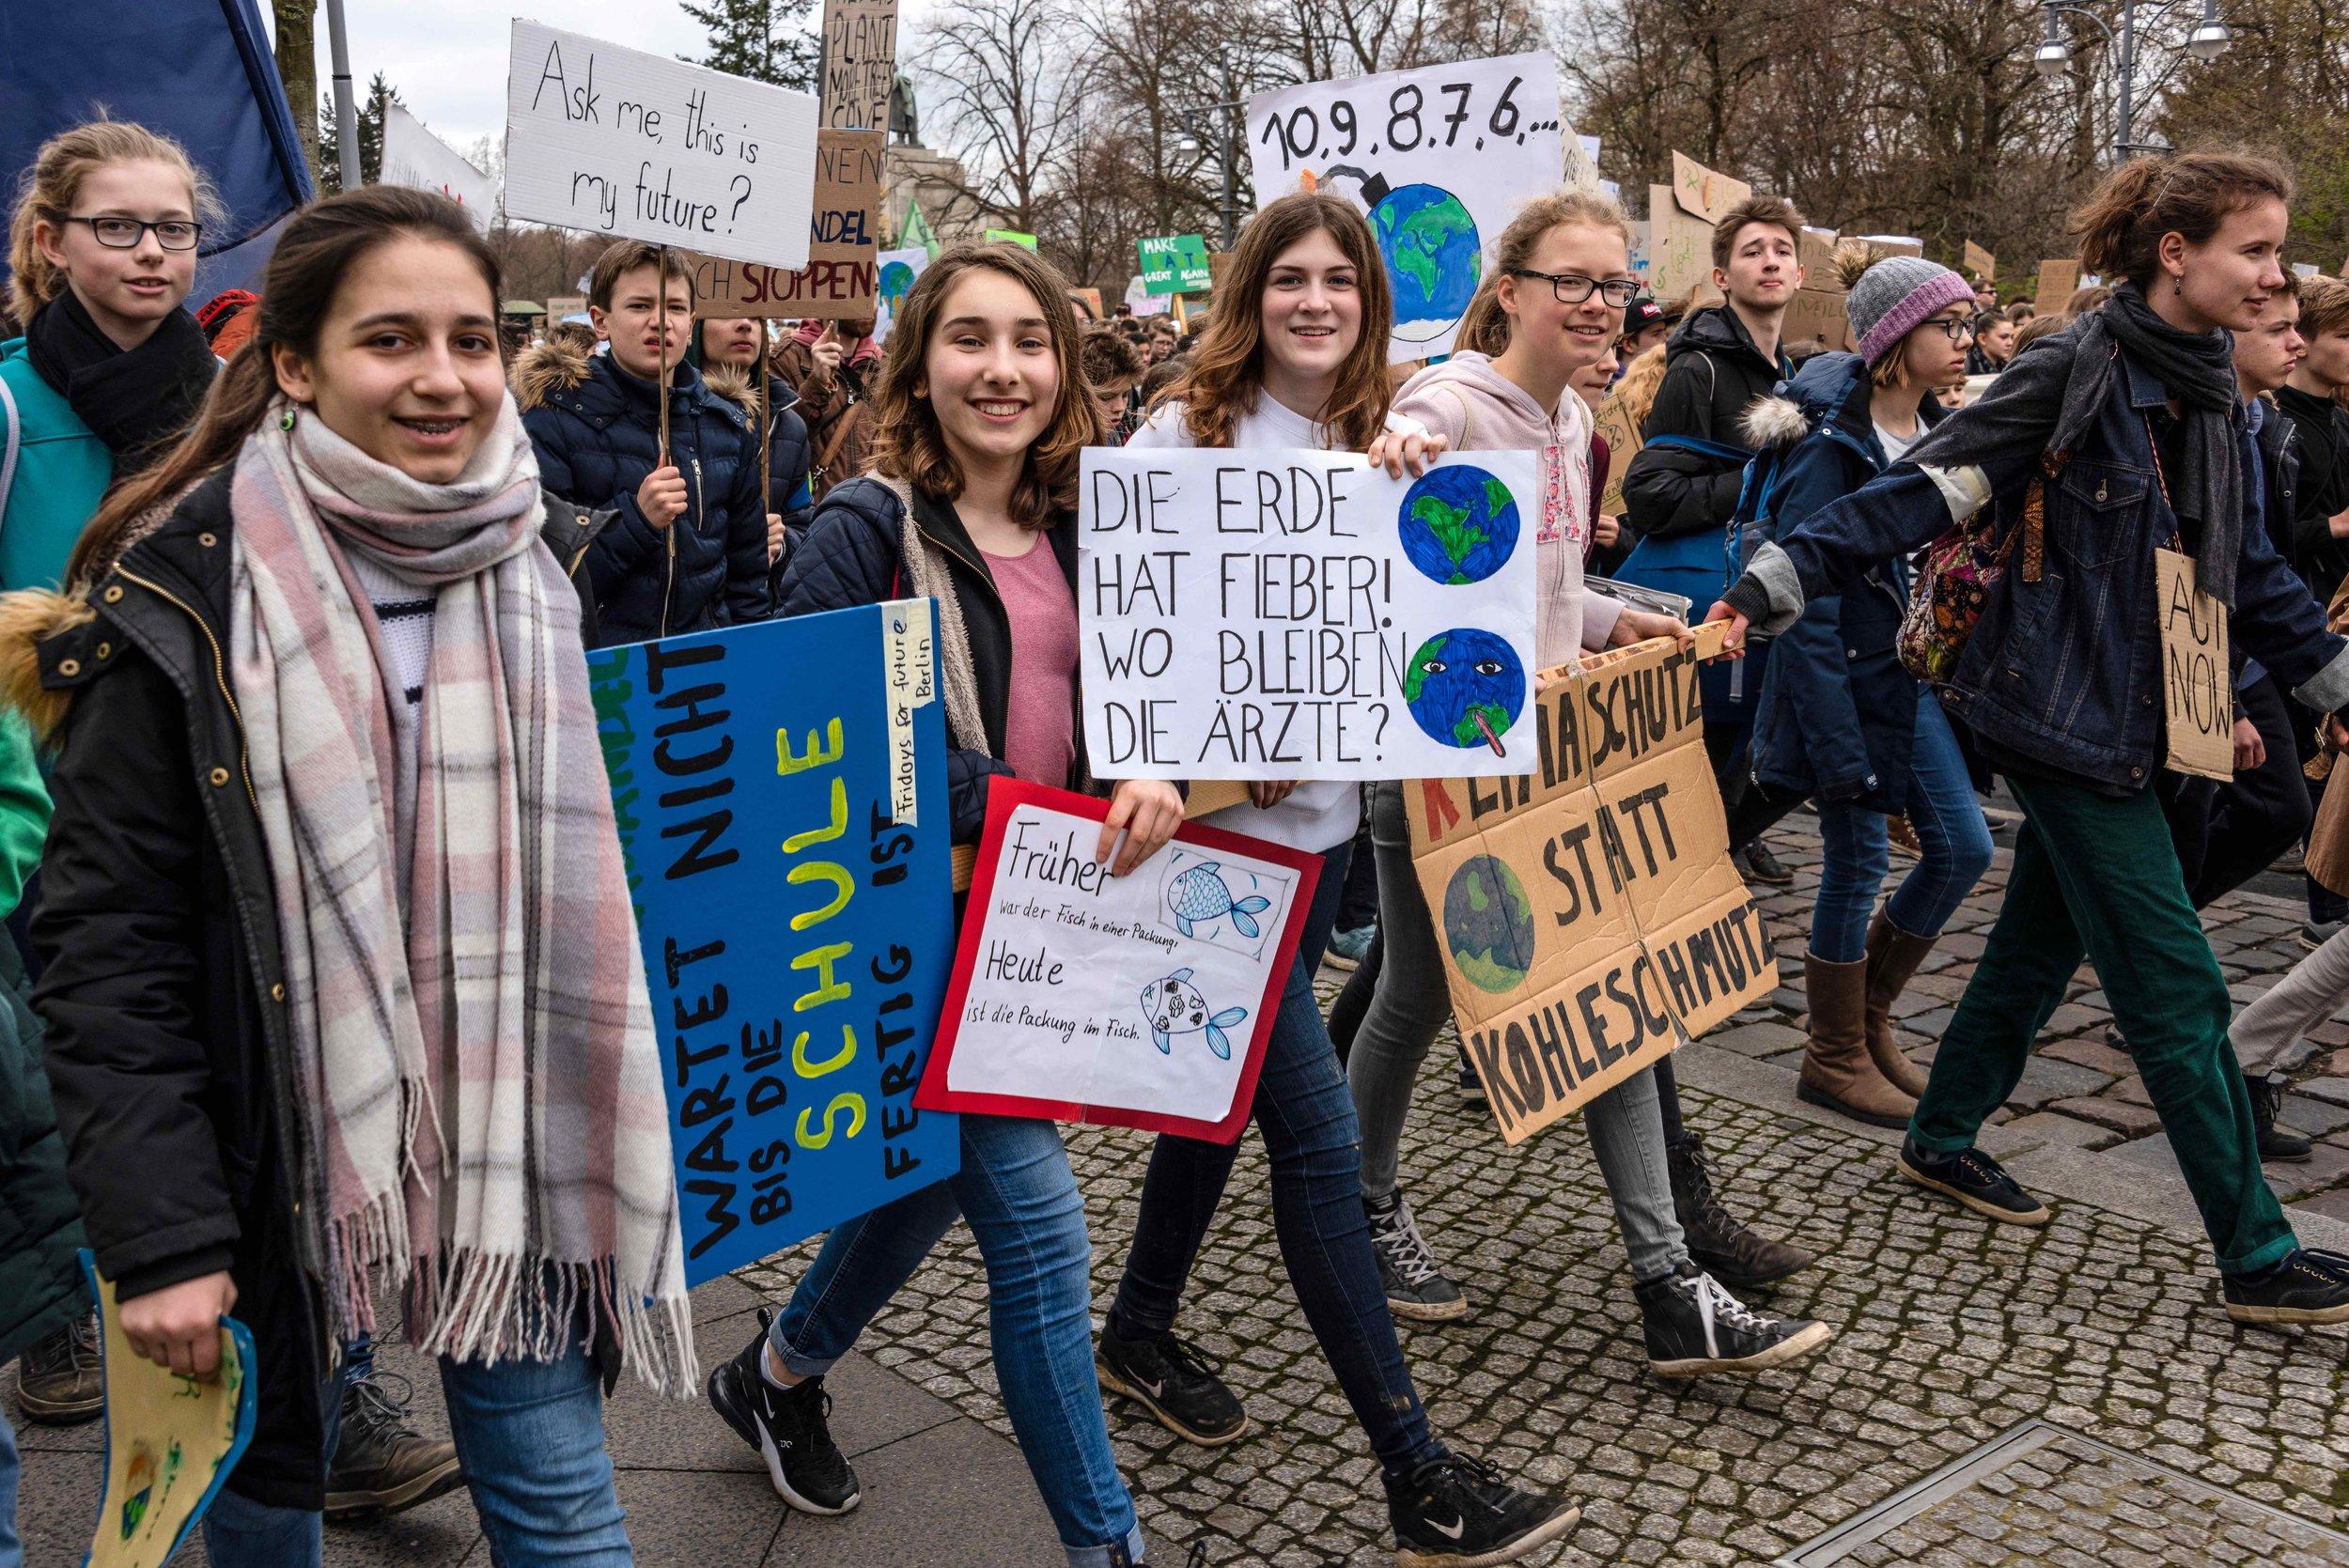 Berlin 2019. Credit: Shutterstock.com